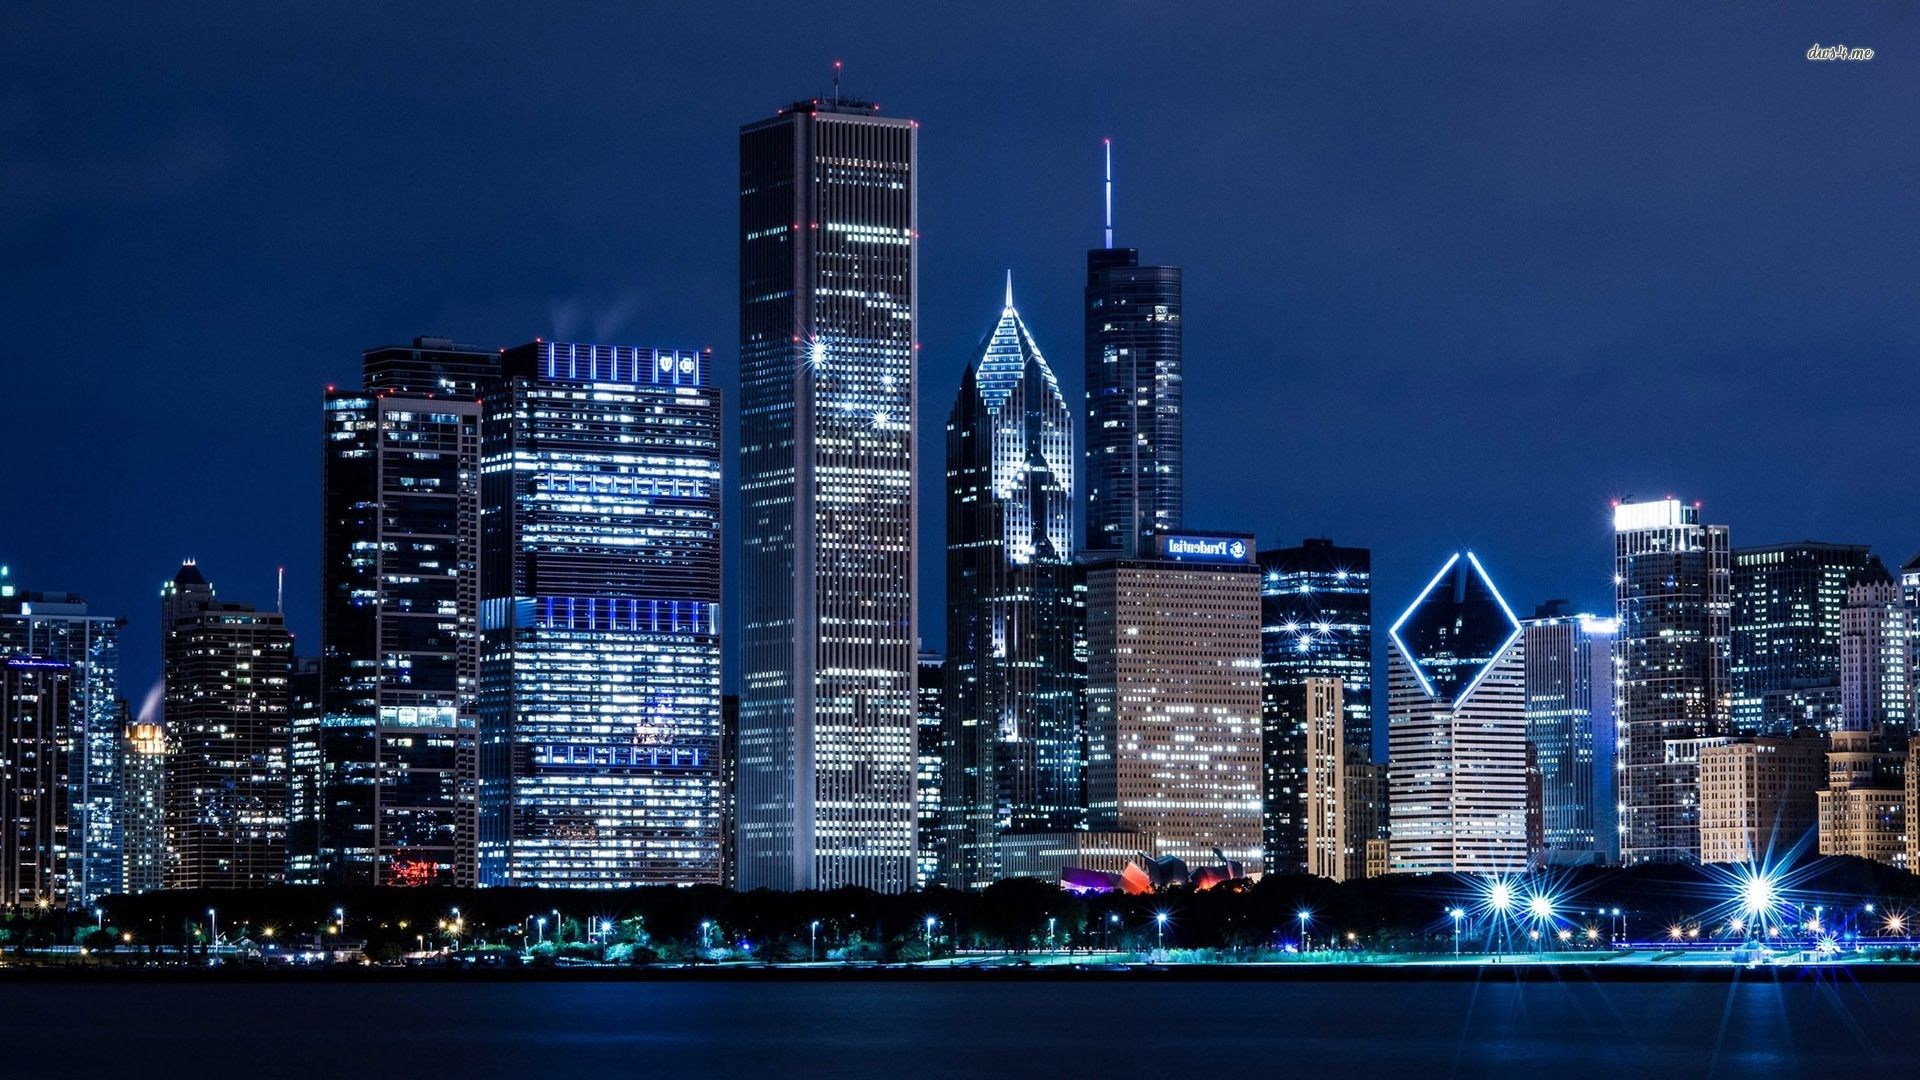 Free chicago skyline wallpaper wallpapersafari - Chicago skyline wallpaper 1920x1080 ...